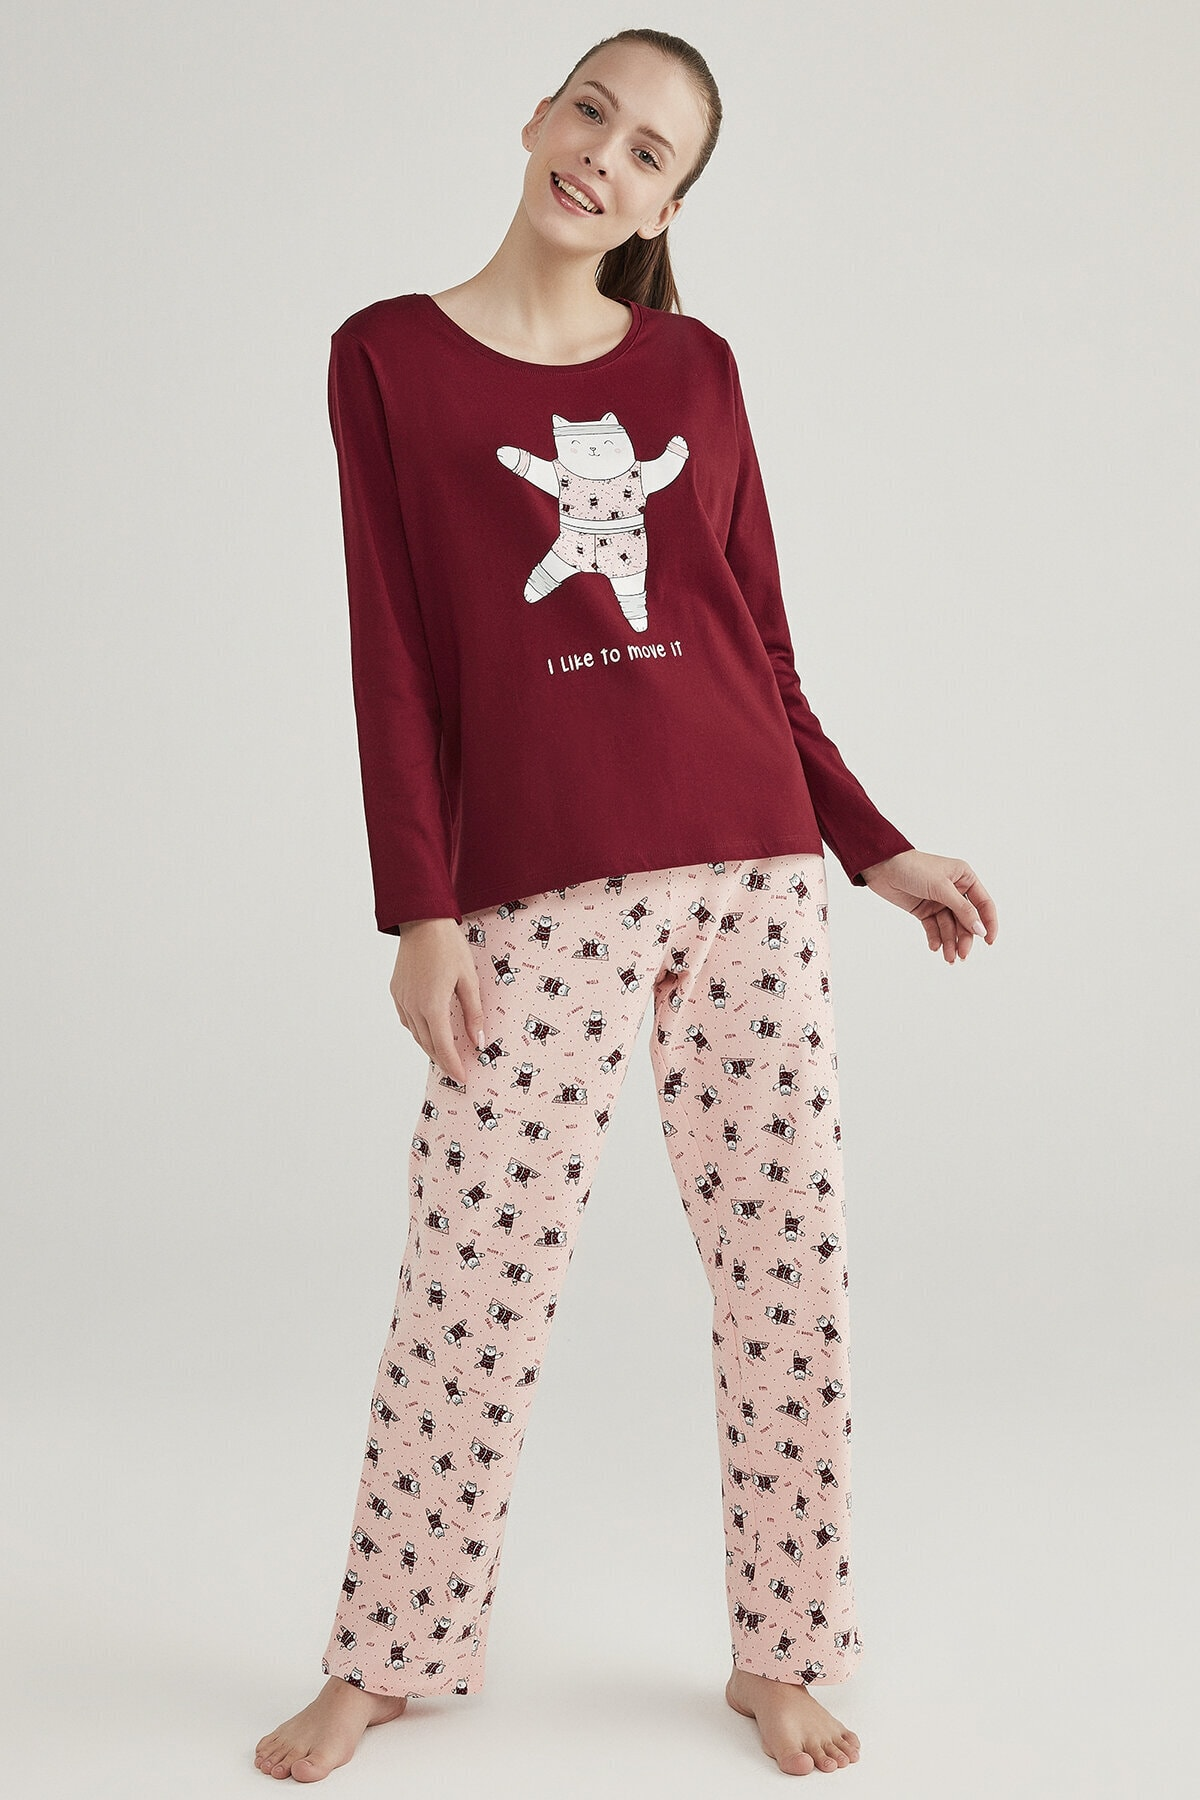 Penti Çok Renkli Gym Cat Pijama Takımı 1